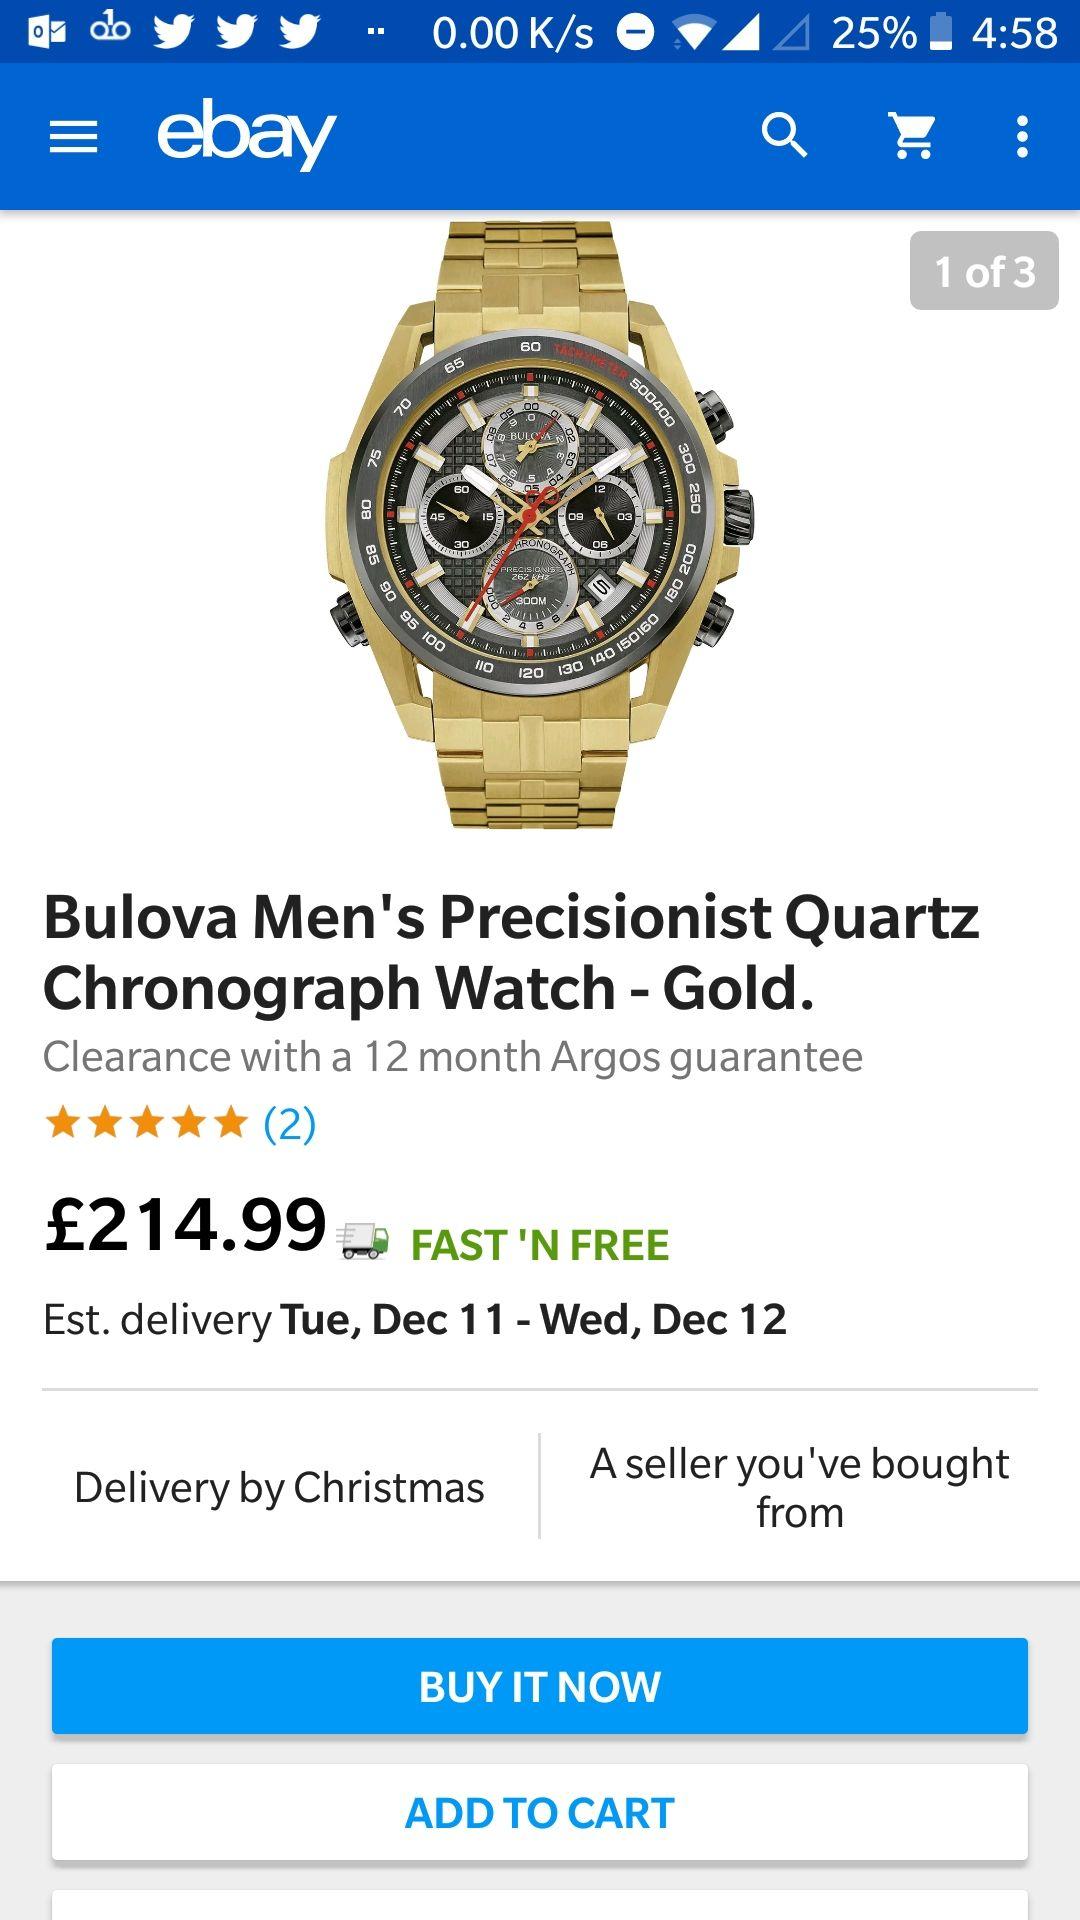 Bulova Men's precisionist  Quartz chronograph watch gold £214.99 - eBay / Argos